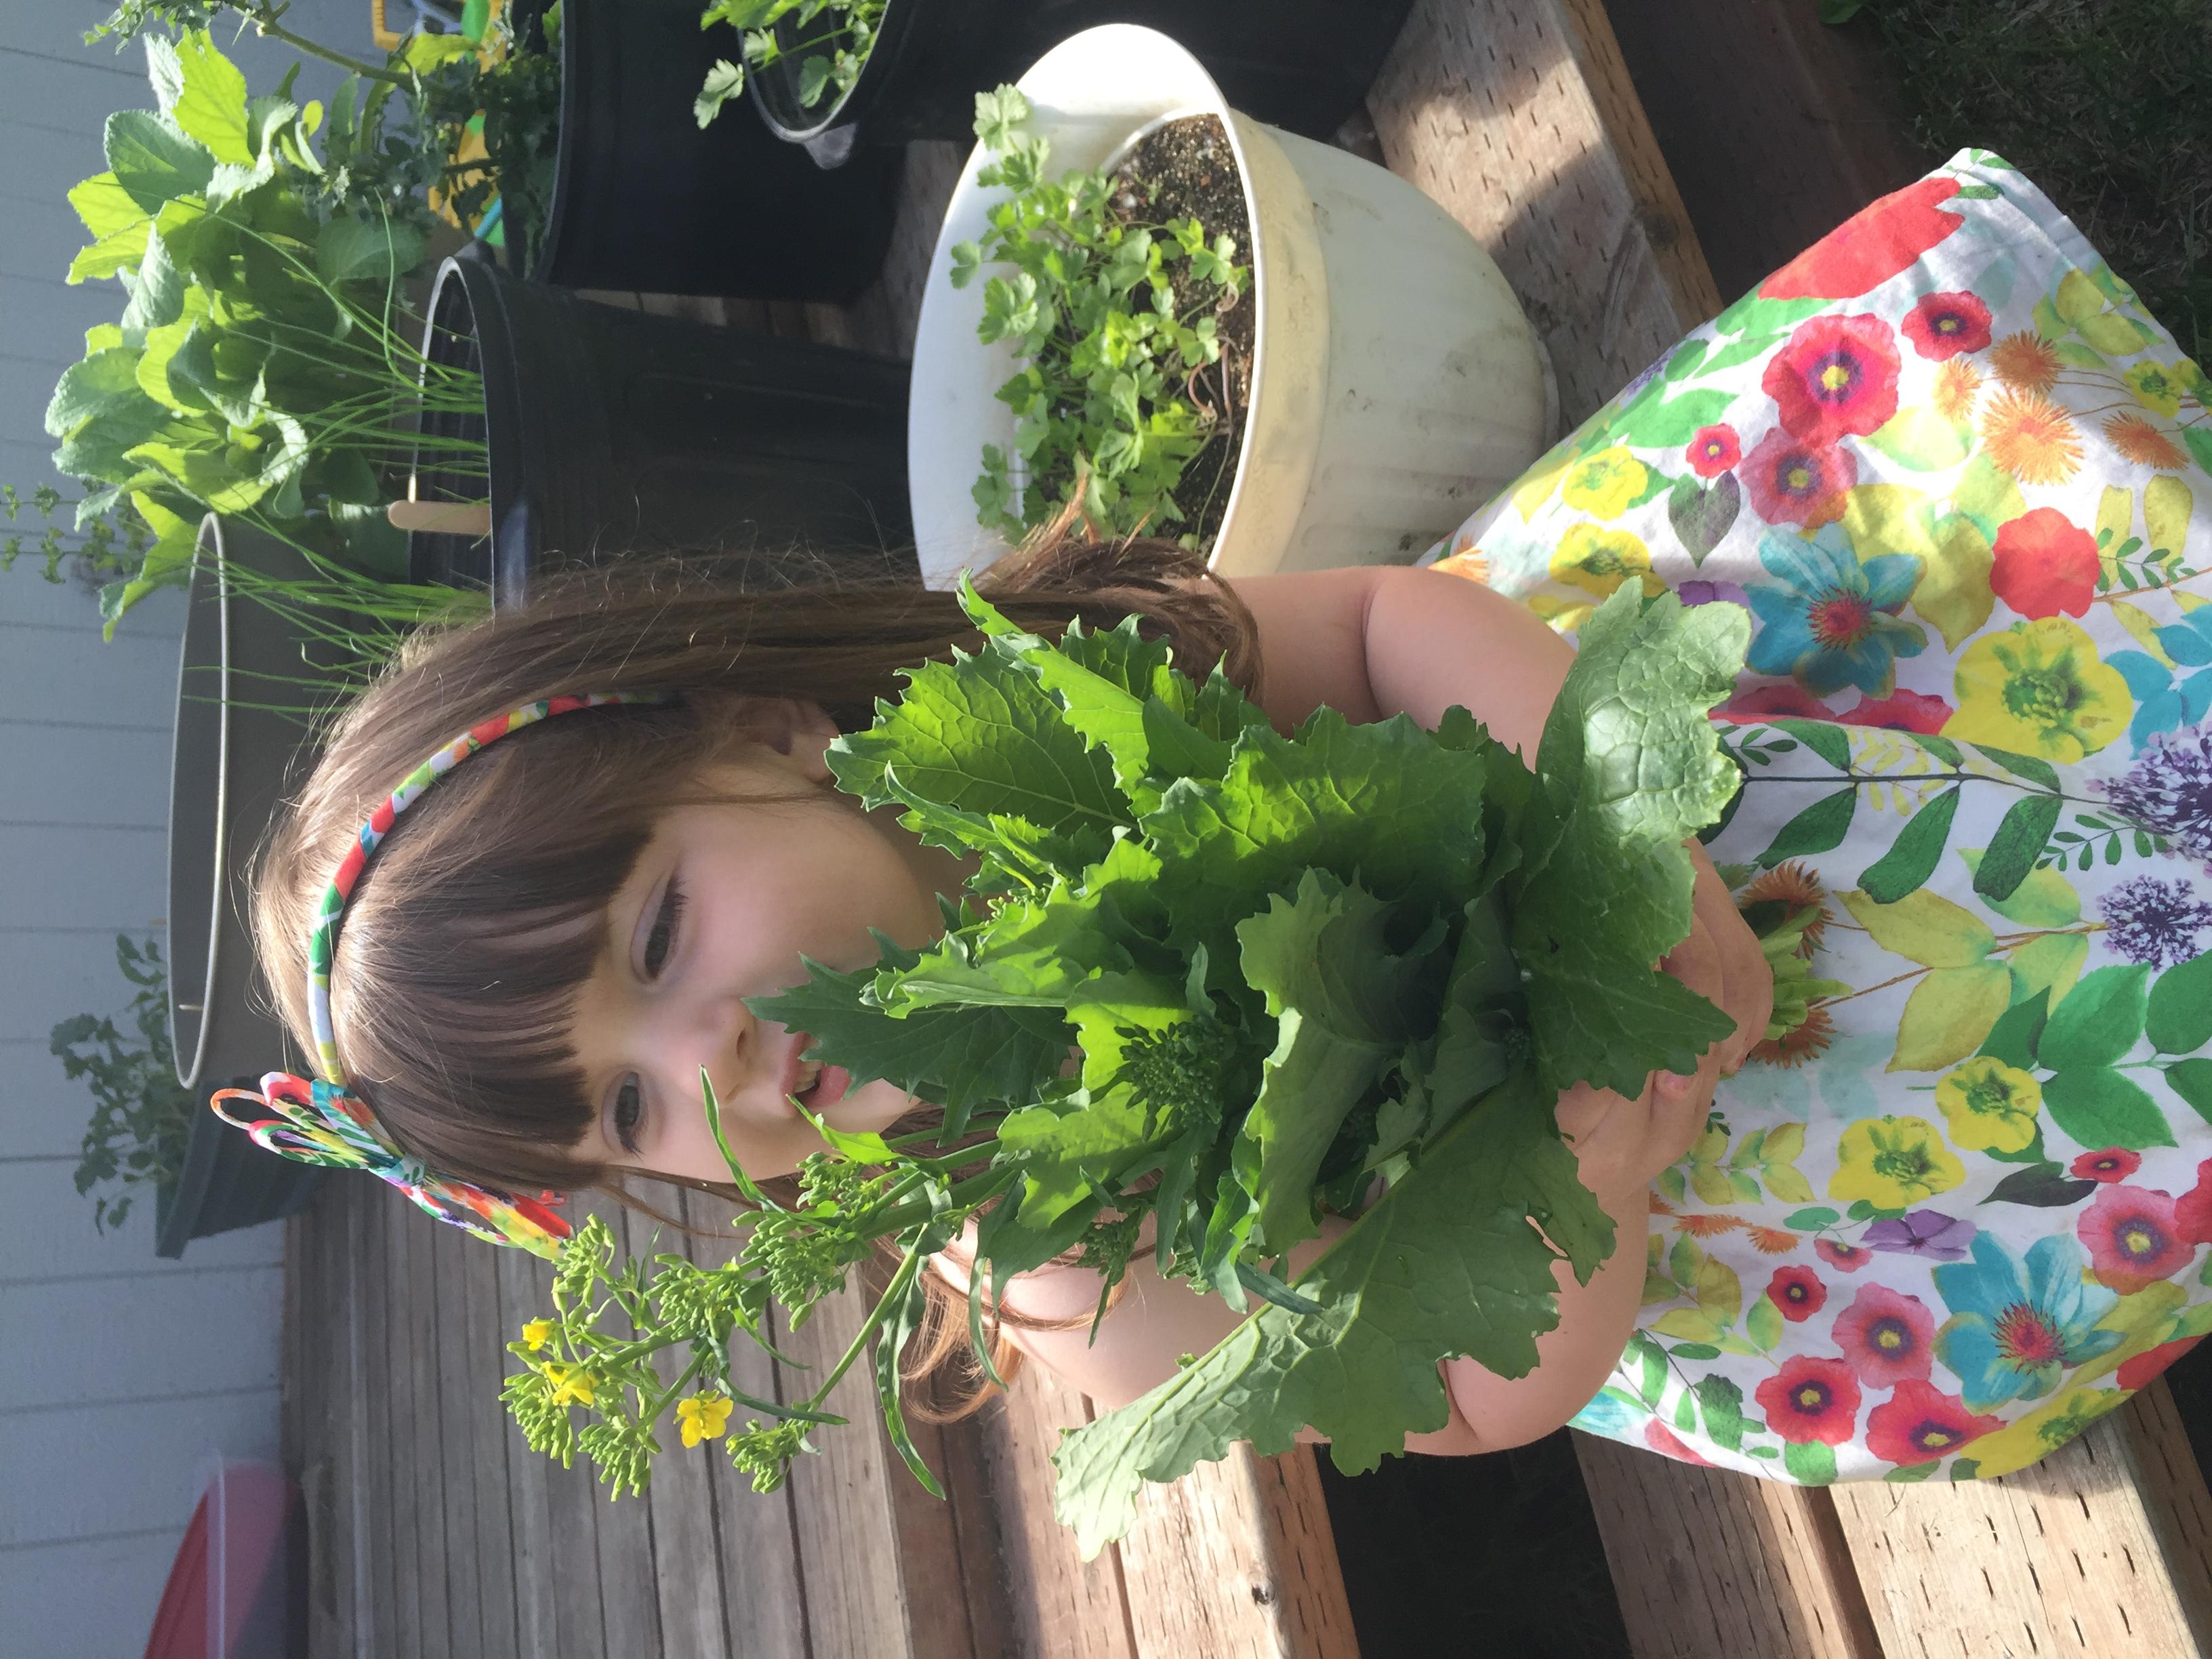 Mavis Mail – Kelly From Wasilla, Alaska Sends in Her Garden Photos